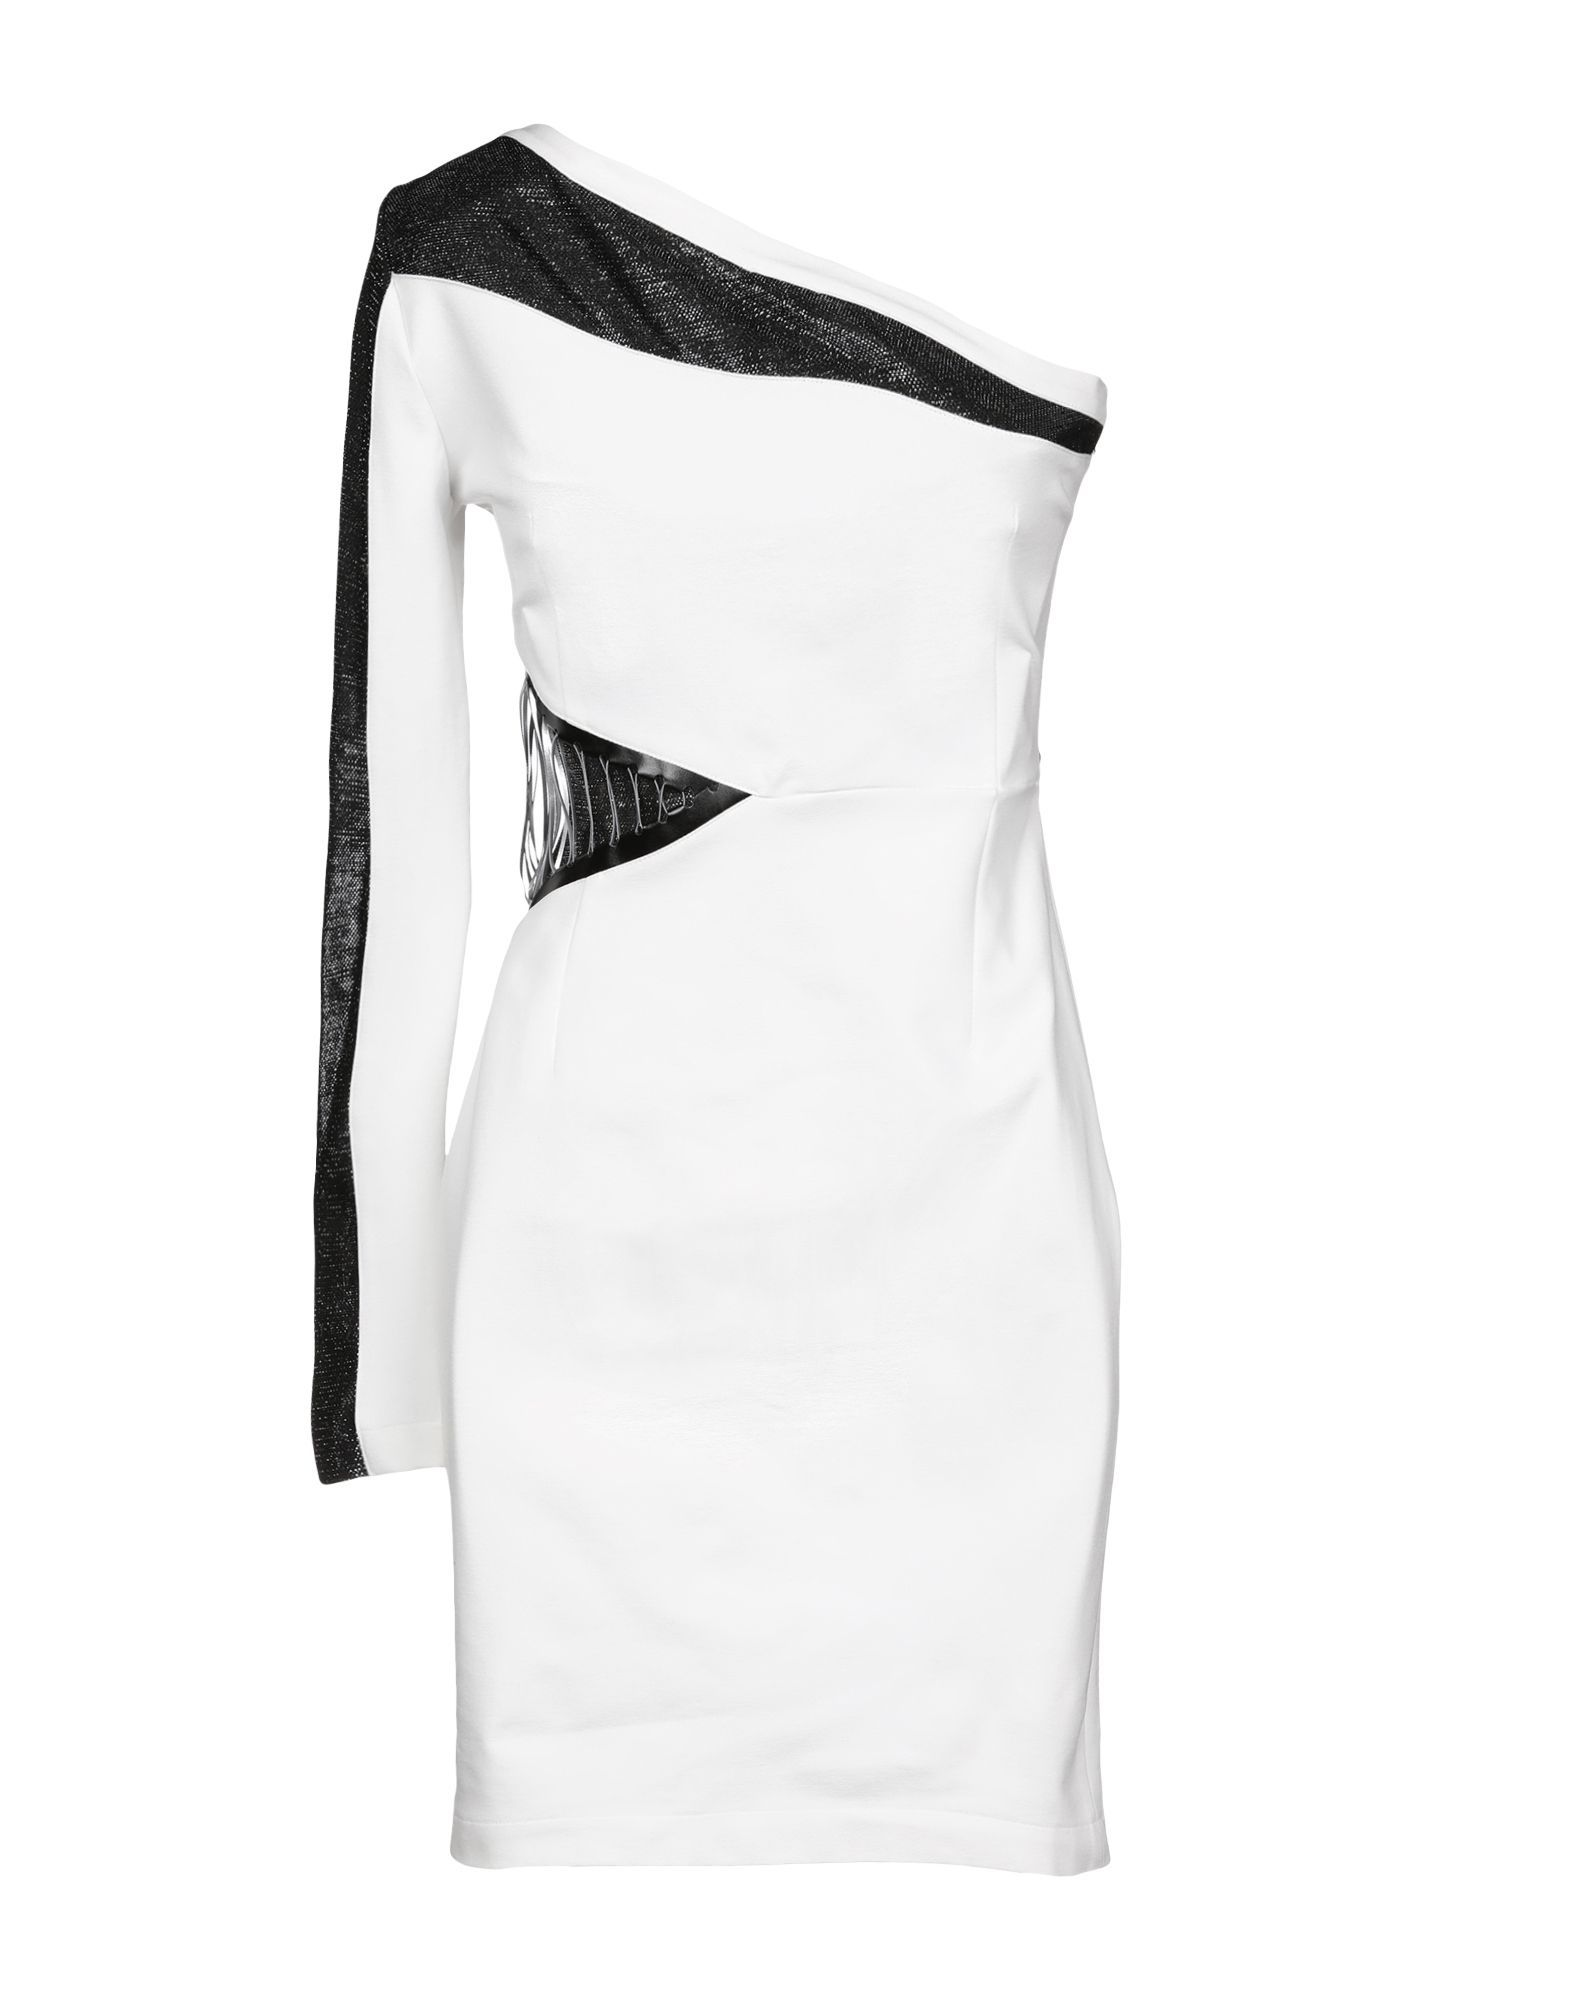 Just Cavalli White Asymmetrical Dress